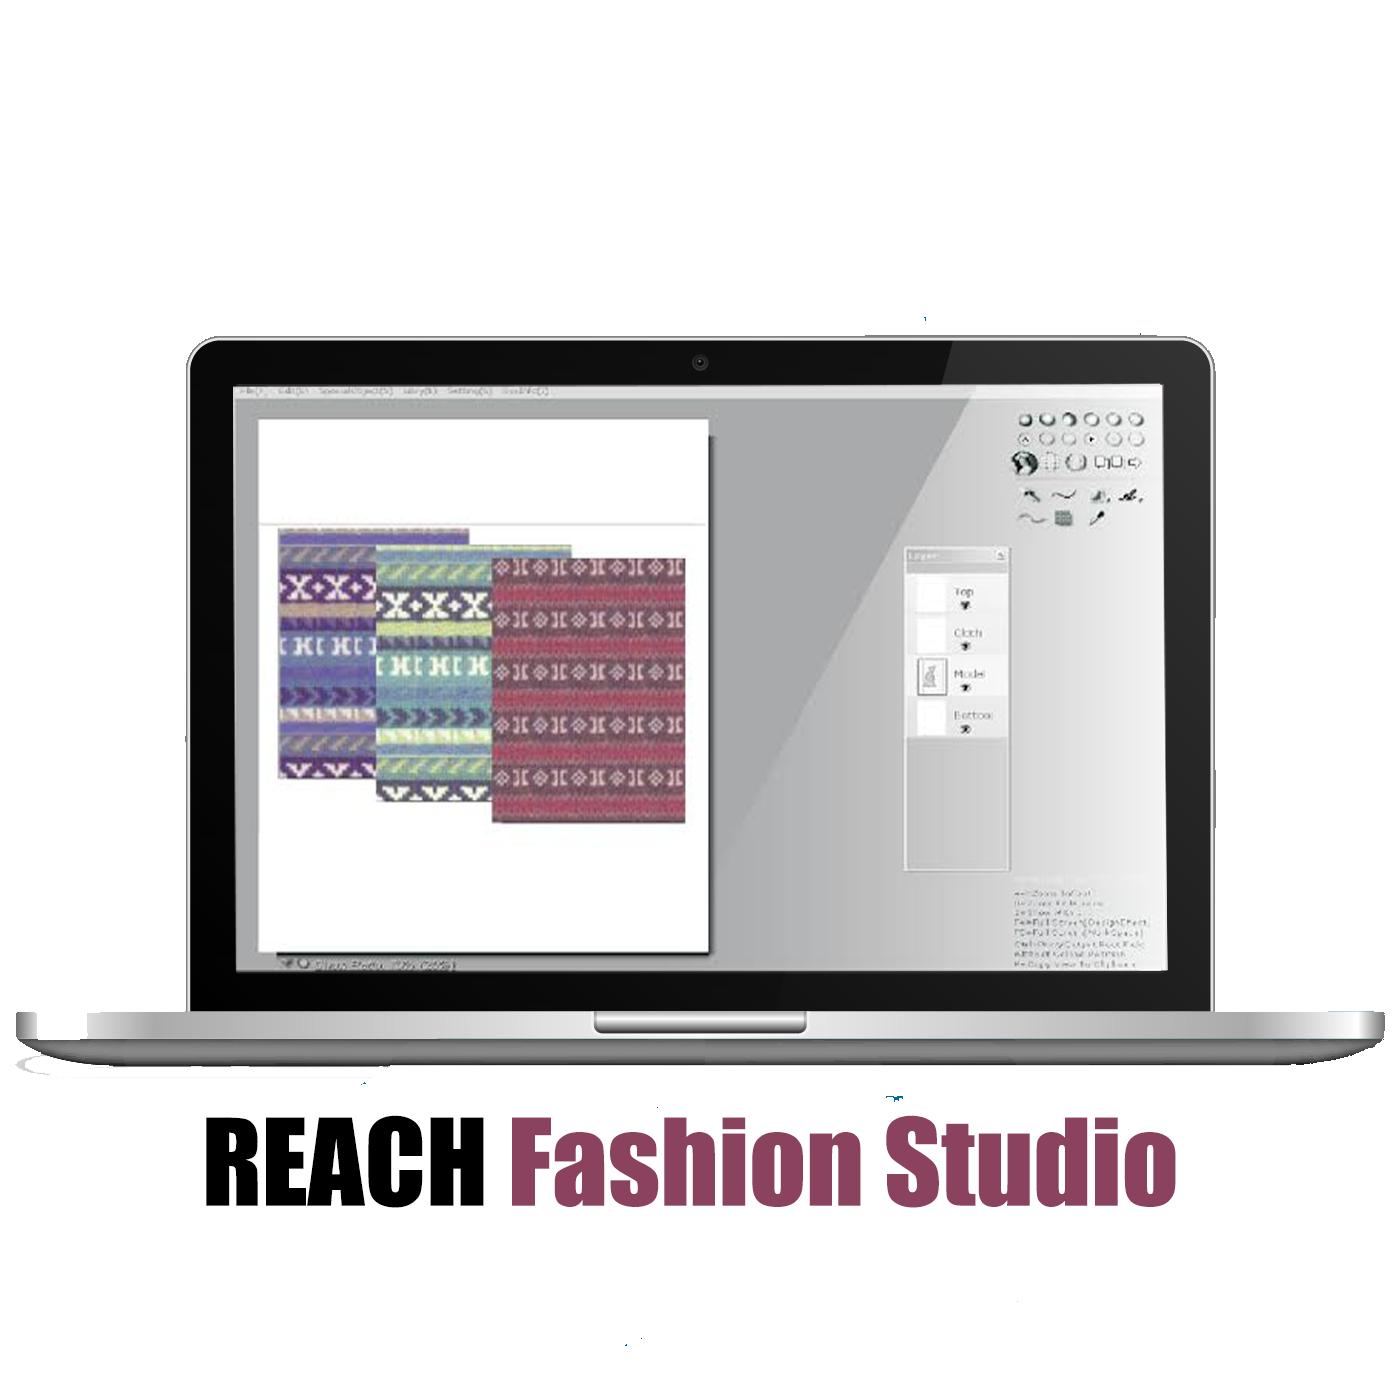 Fashion Apparel garment Clothing Textile Leather Interior